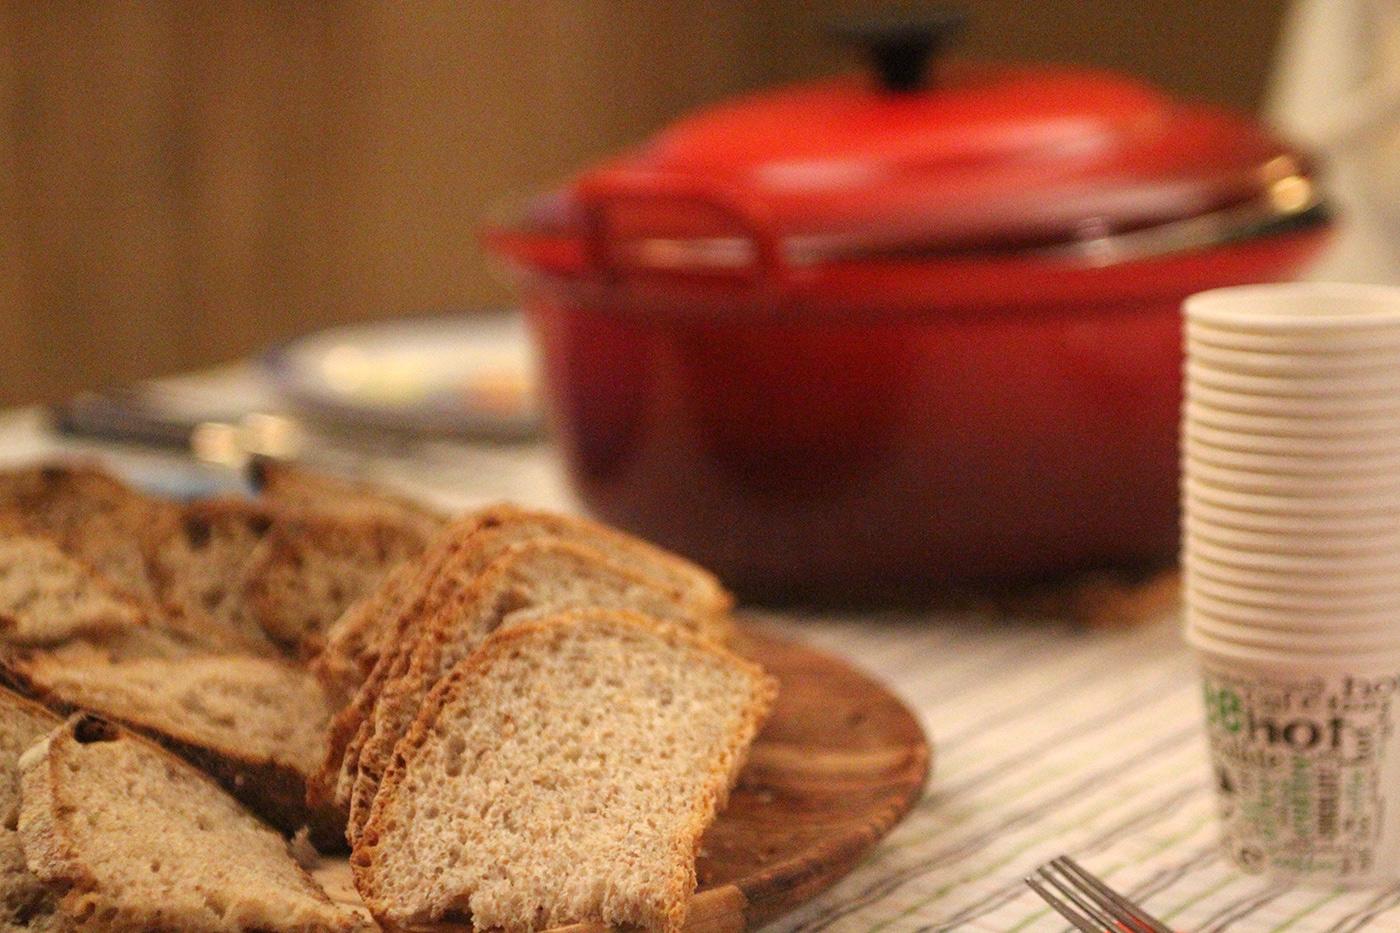 cider-maken-avondeten-brood